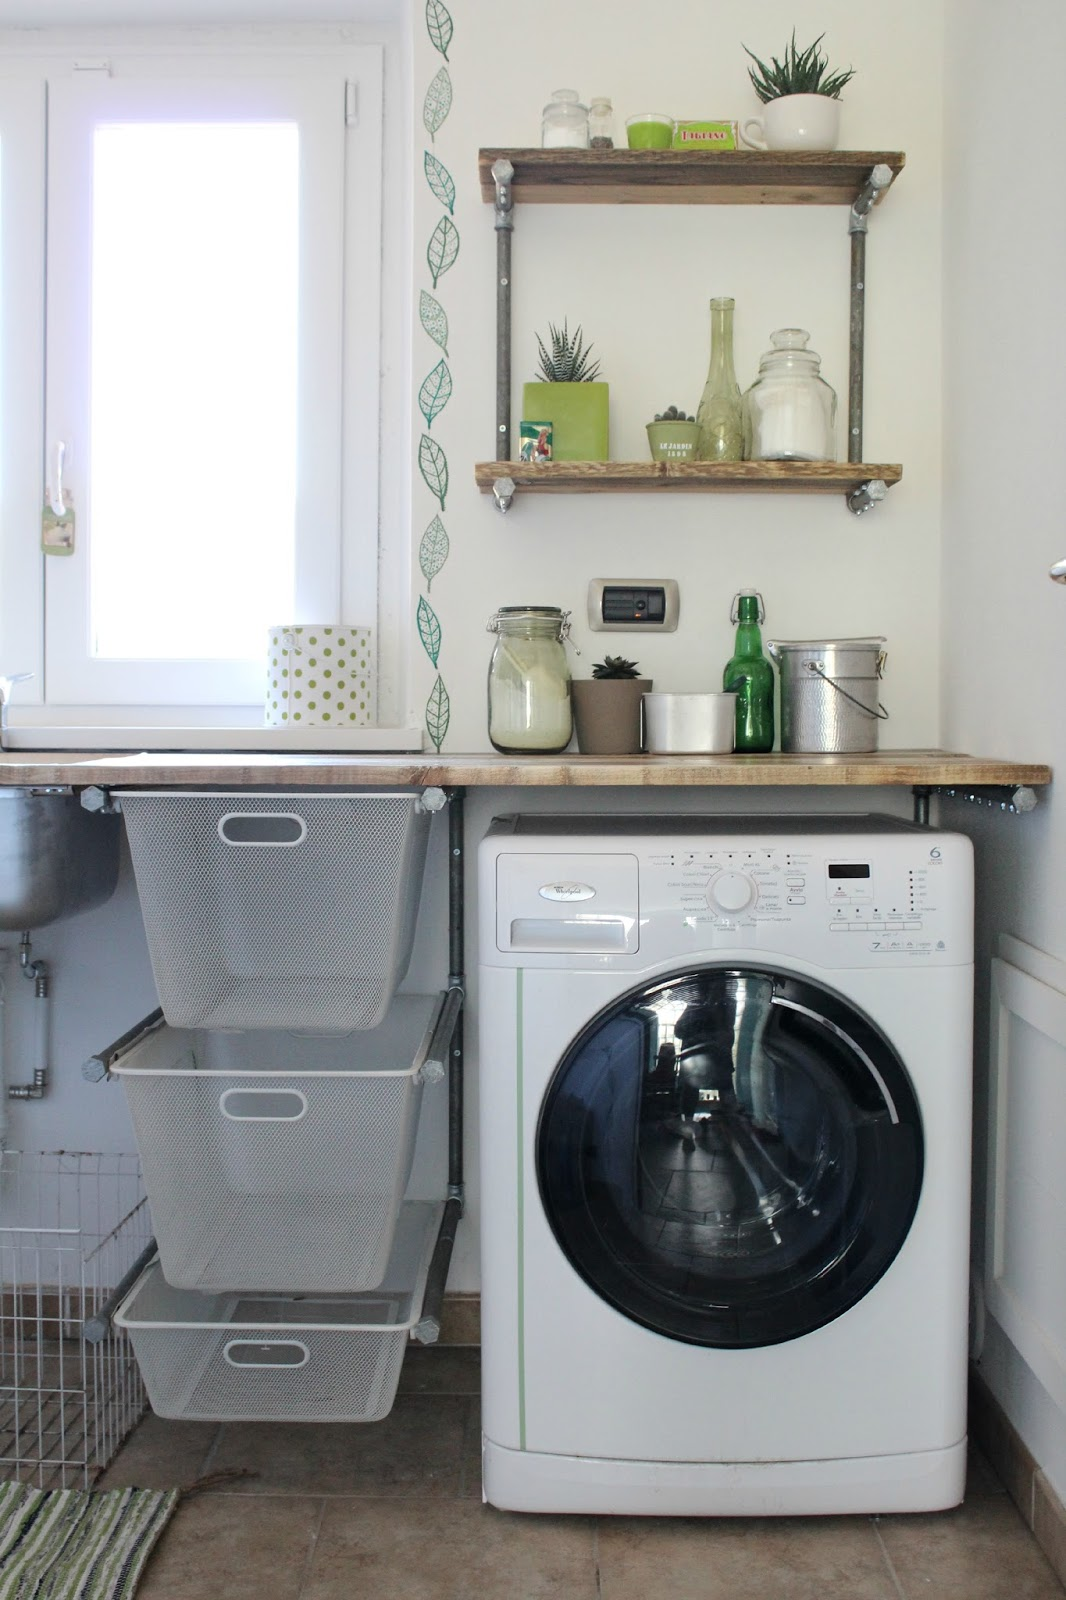 Vivere a piedi nudi living barefoot laundry makeover for Portabiancheria ikea